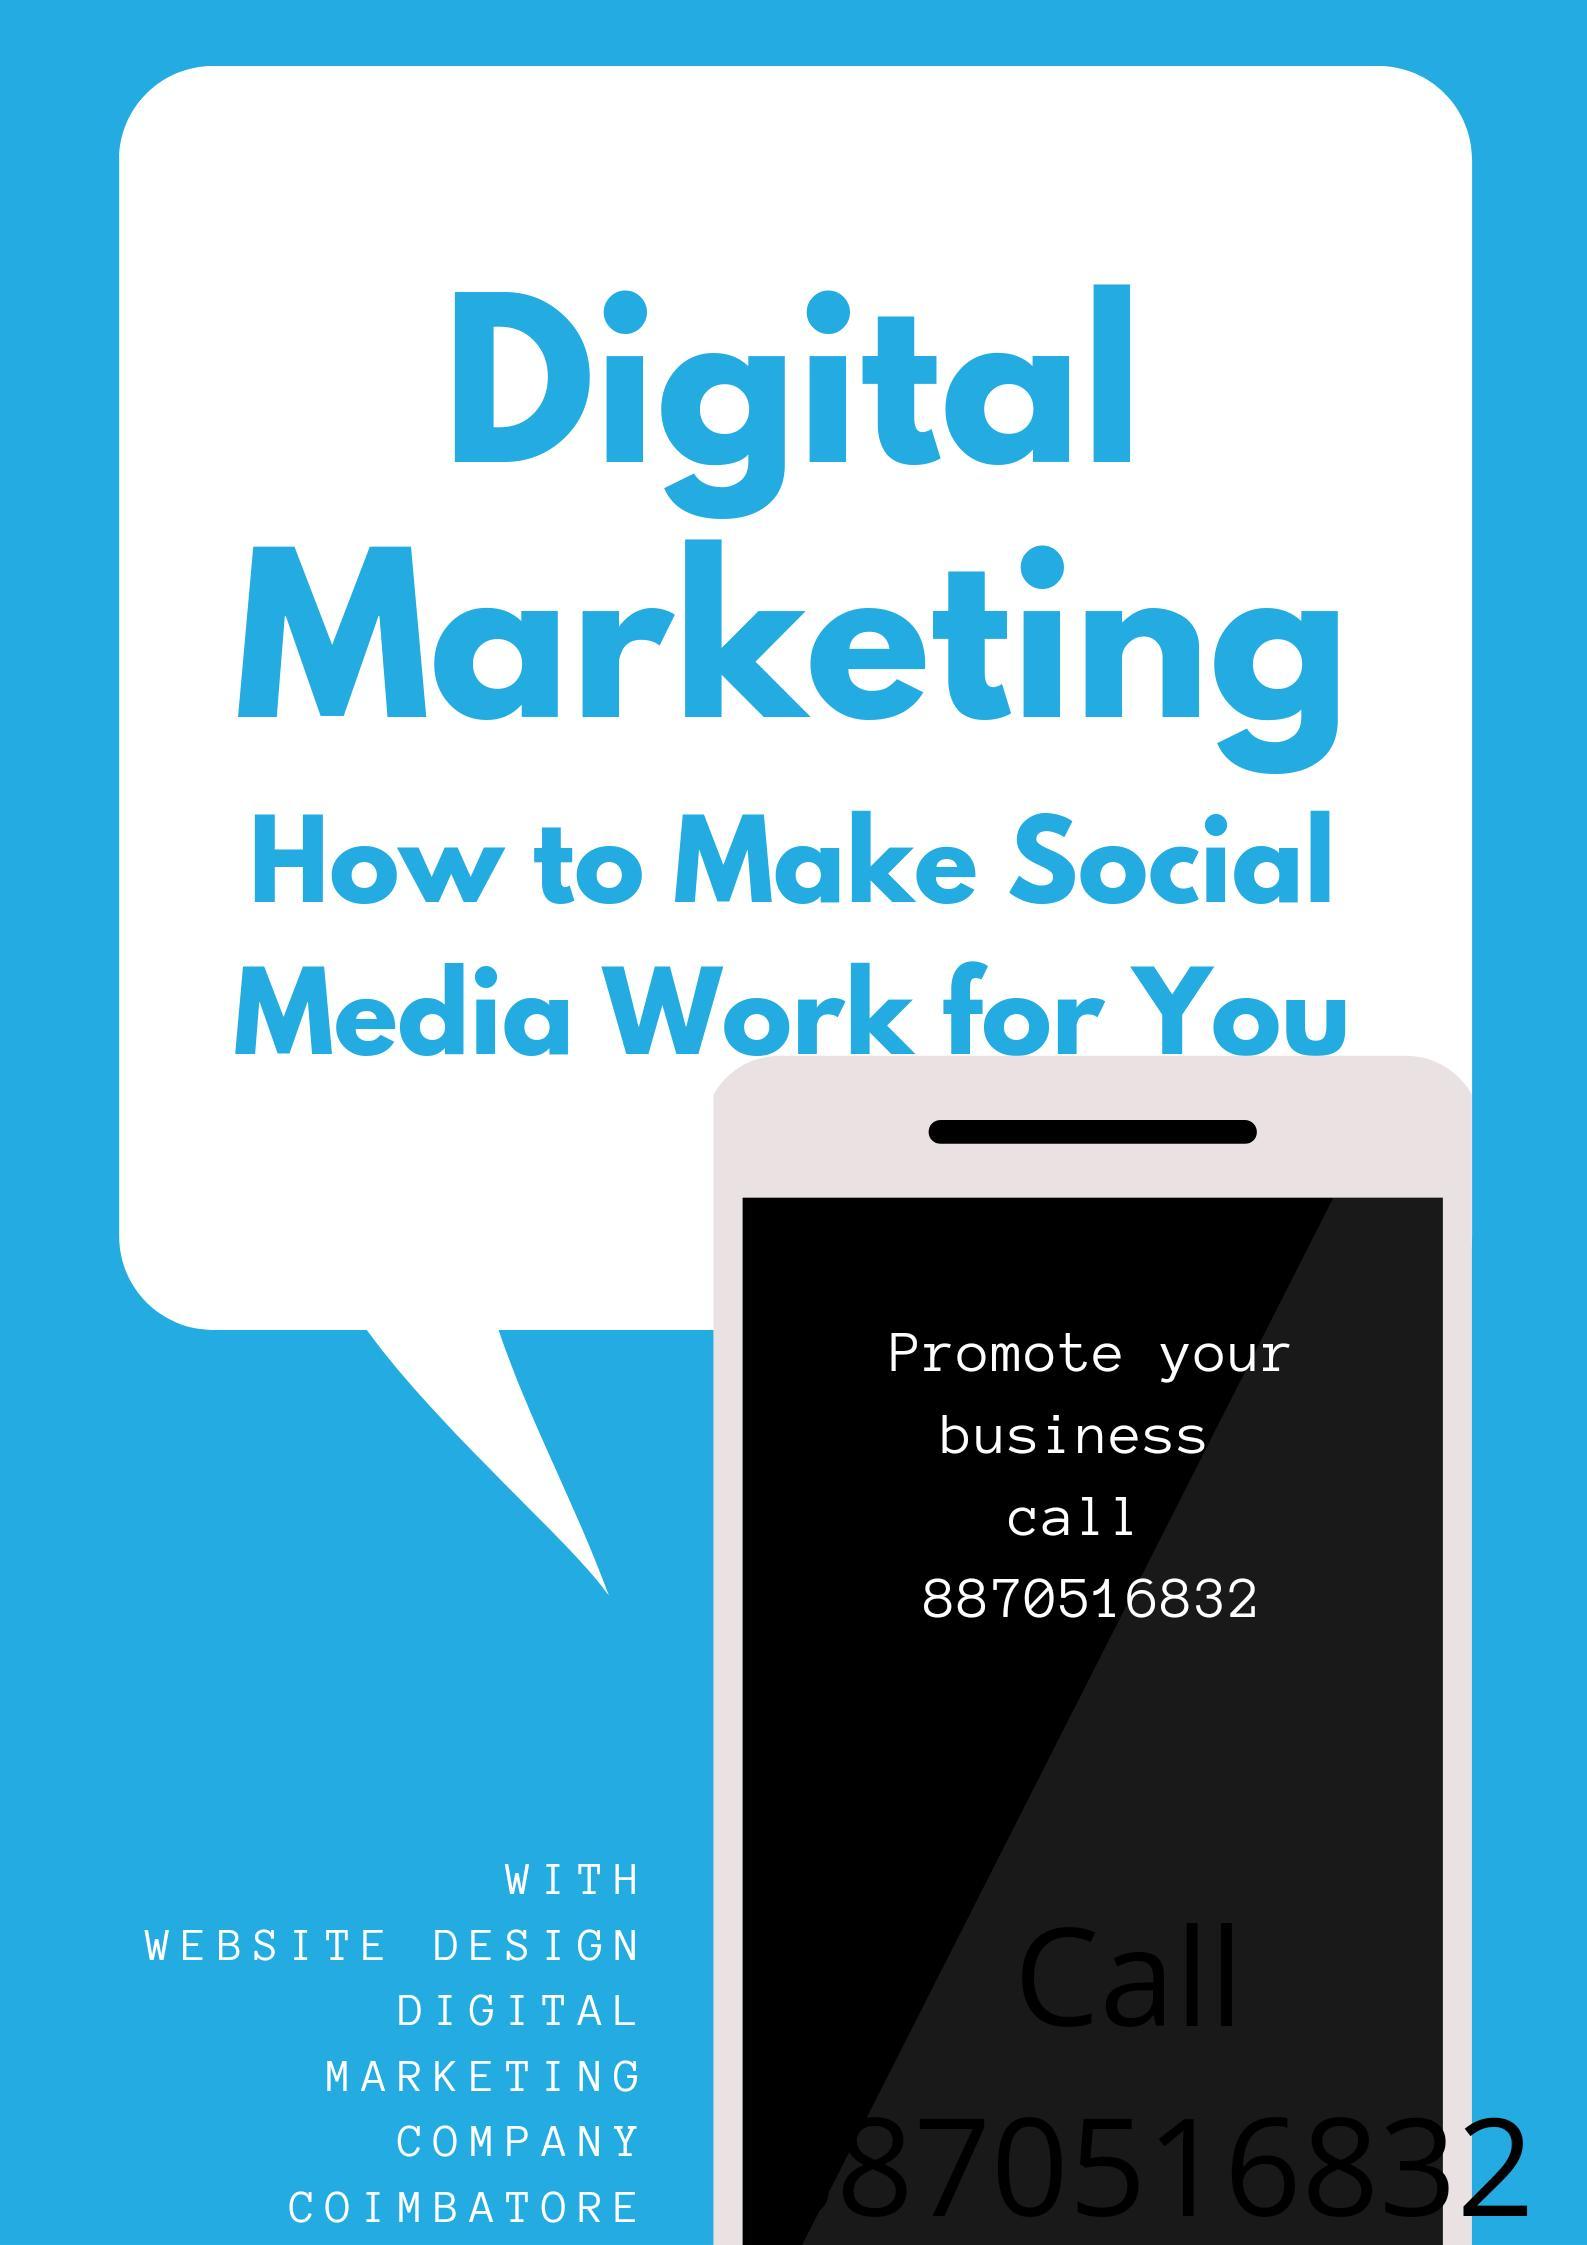 Website design digital marketing company coimbatore